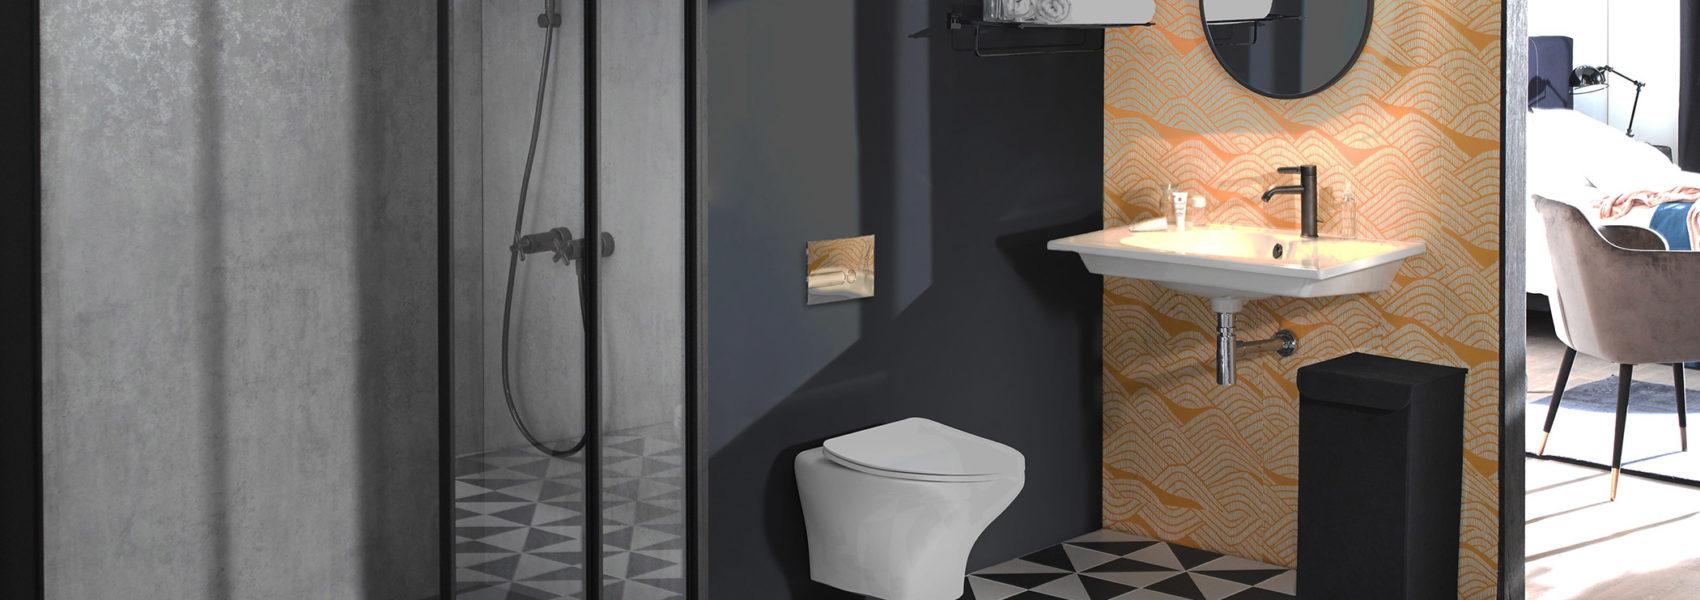 salle bain vintage